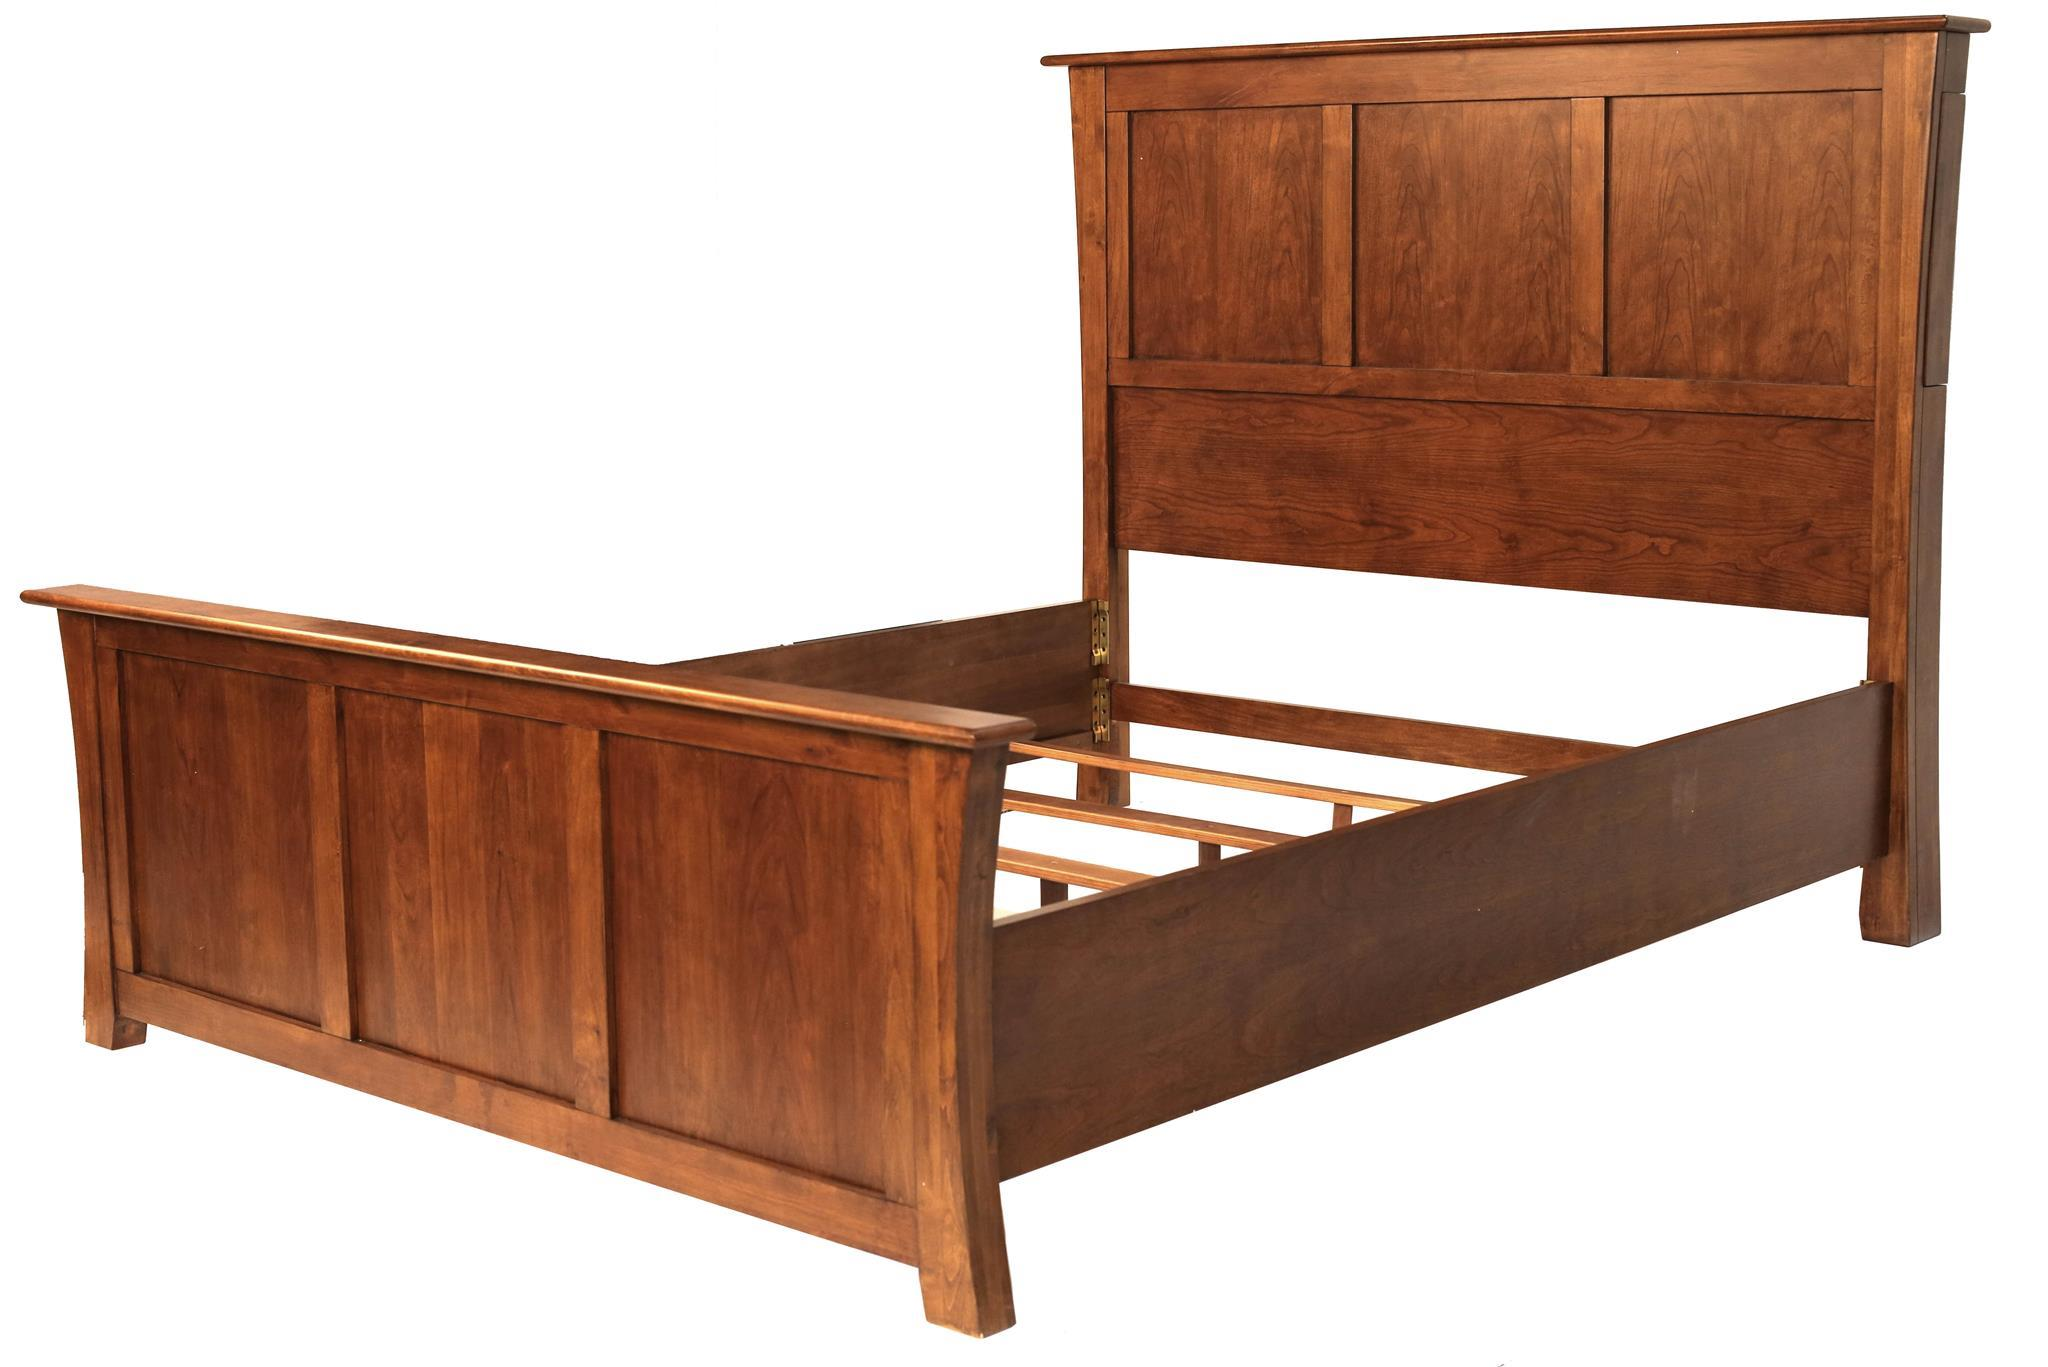 AAmerica Grant Park California King Panel Bed - Item Number: GPKPE5230